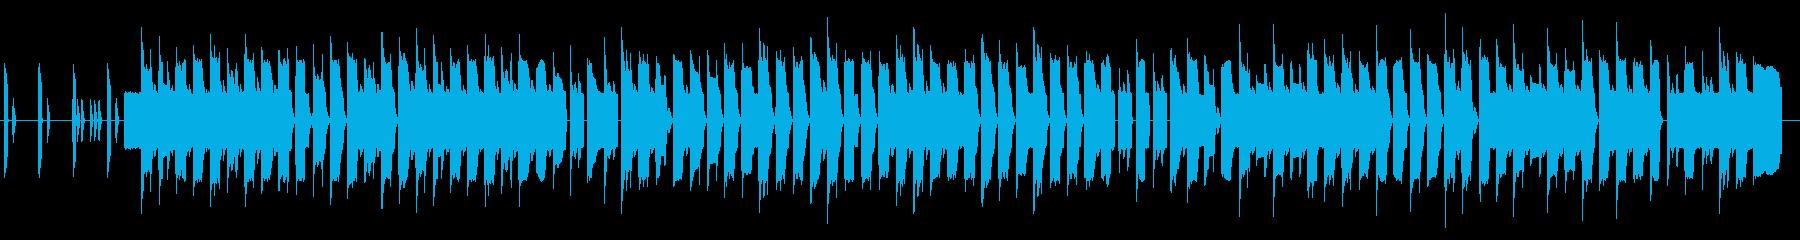 NES RPG B01-1(タイトル)の再生済みの波形